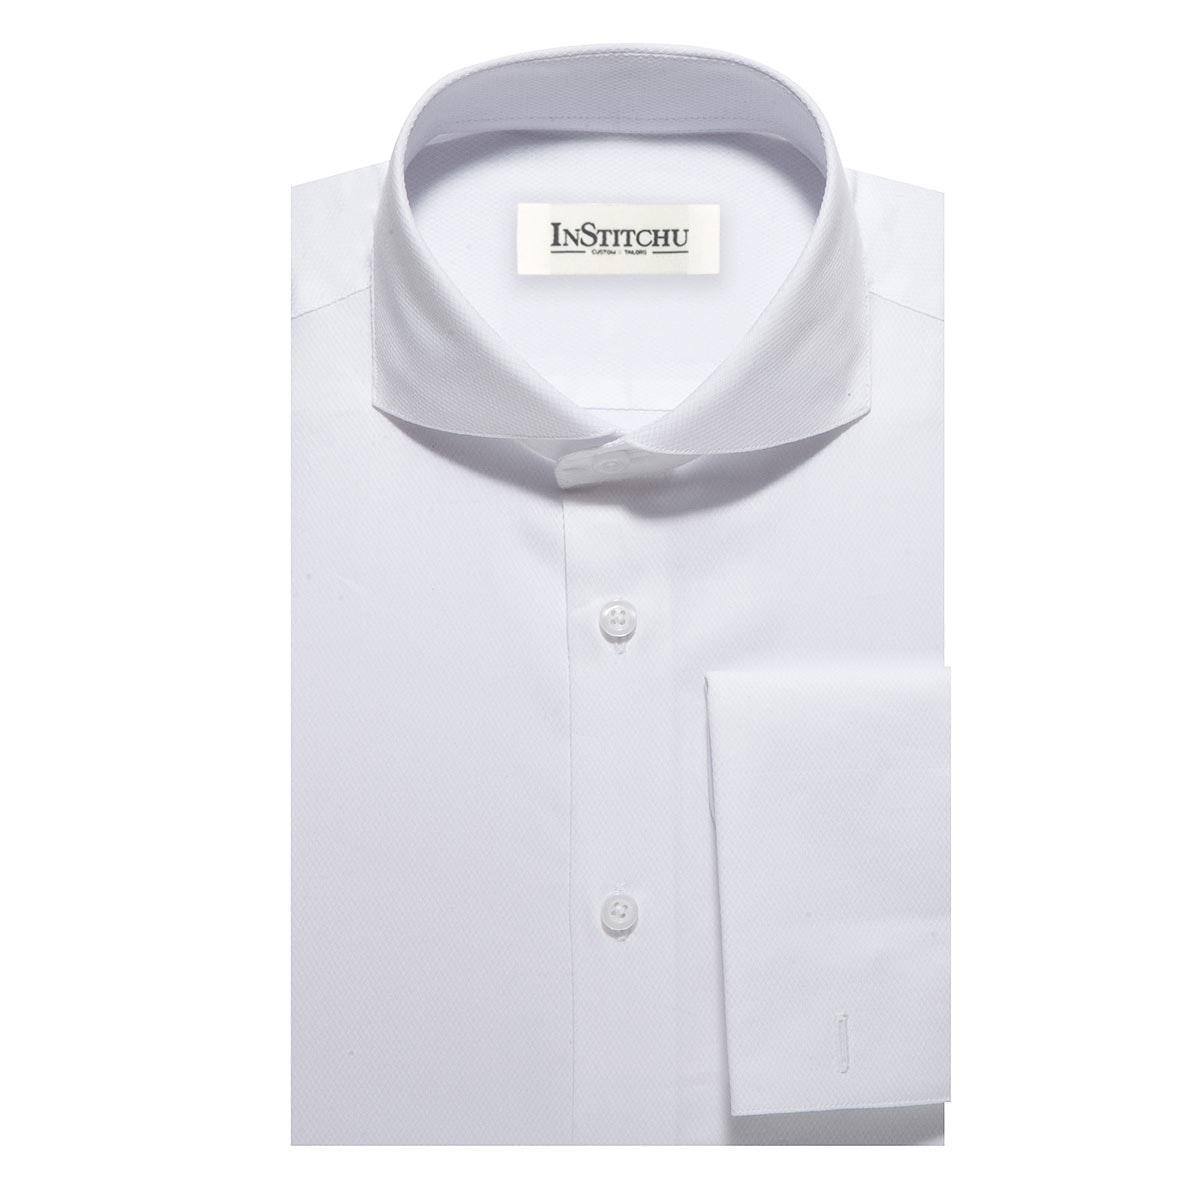 InStitchu Collection The Vero White Shirt